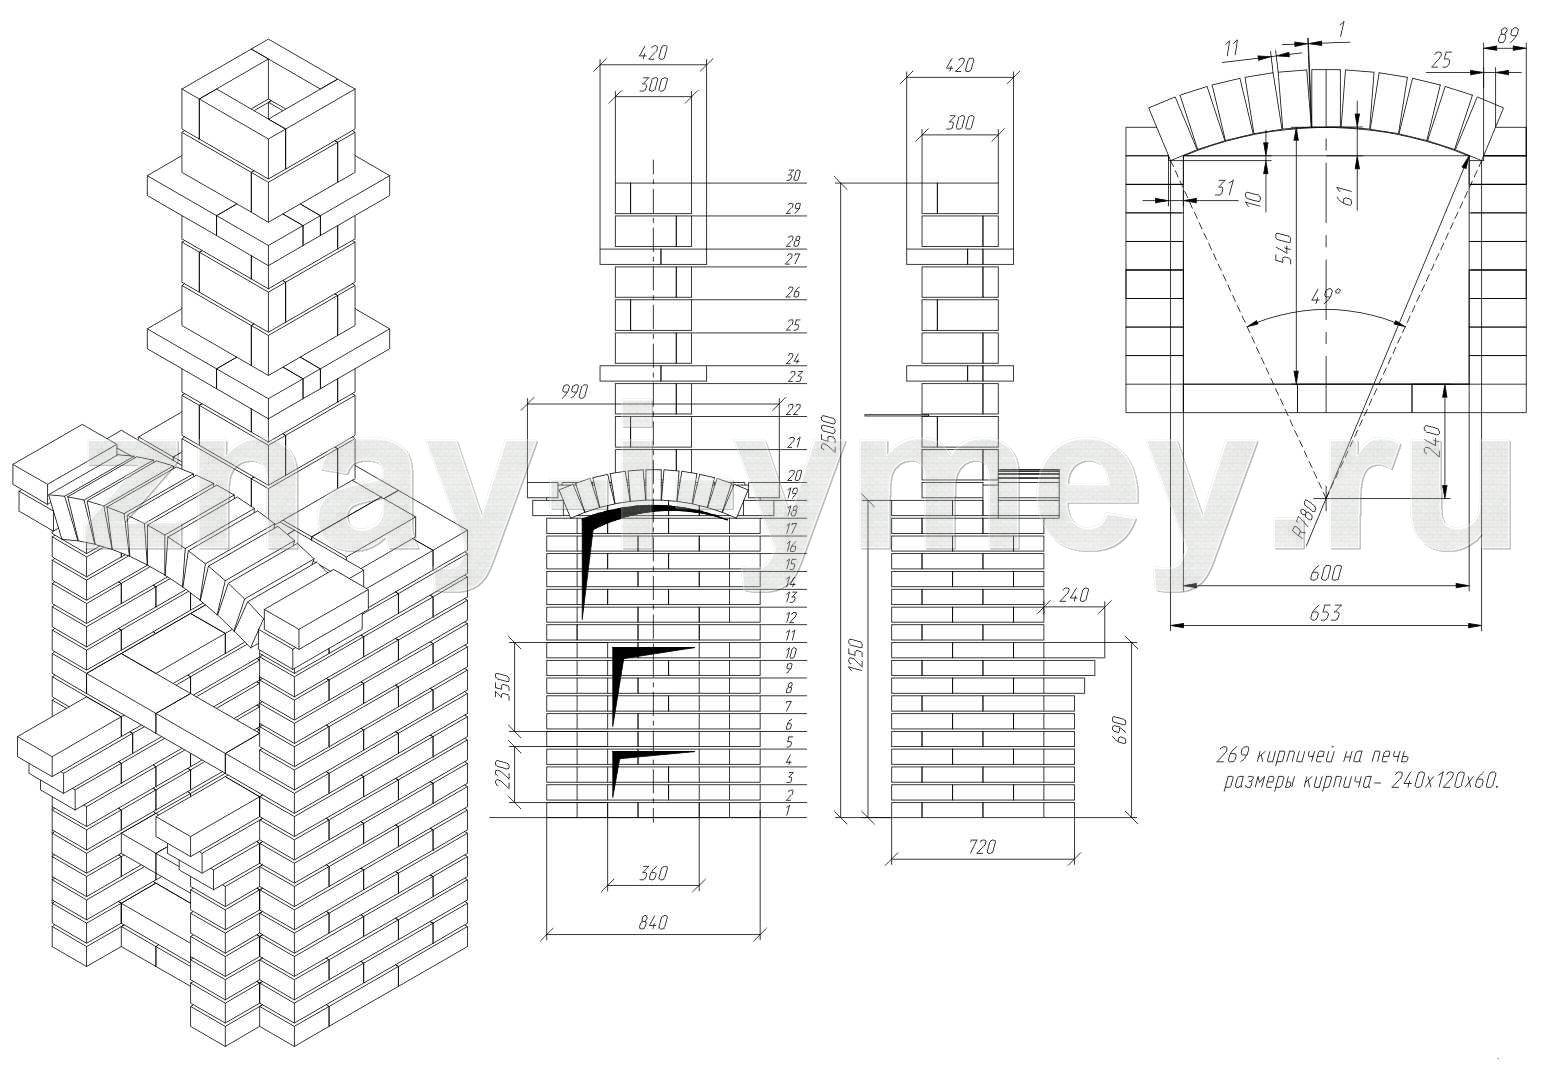 Мангал-камин из кирпича своими руками схема 57